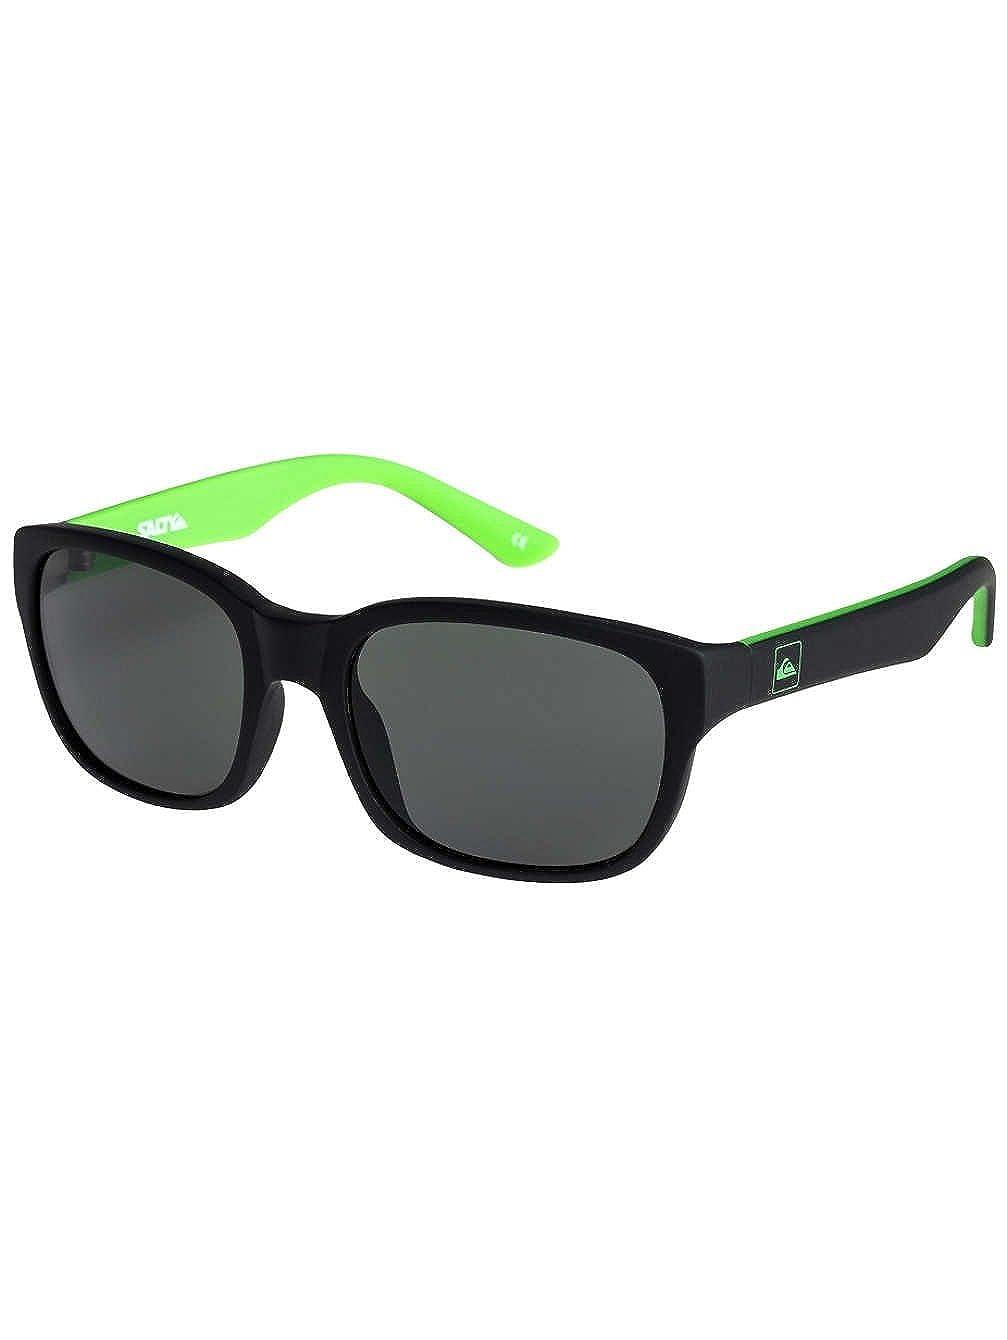 Salty quiksilver sunglassesEQBEY03000 xkss